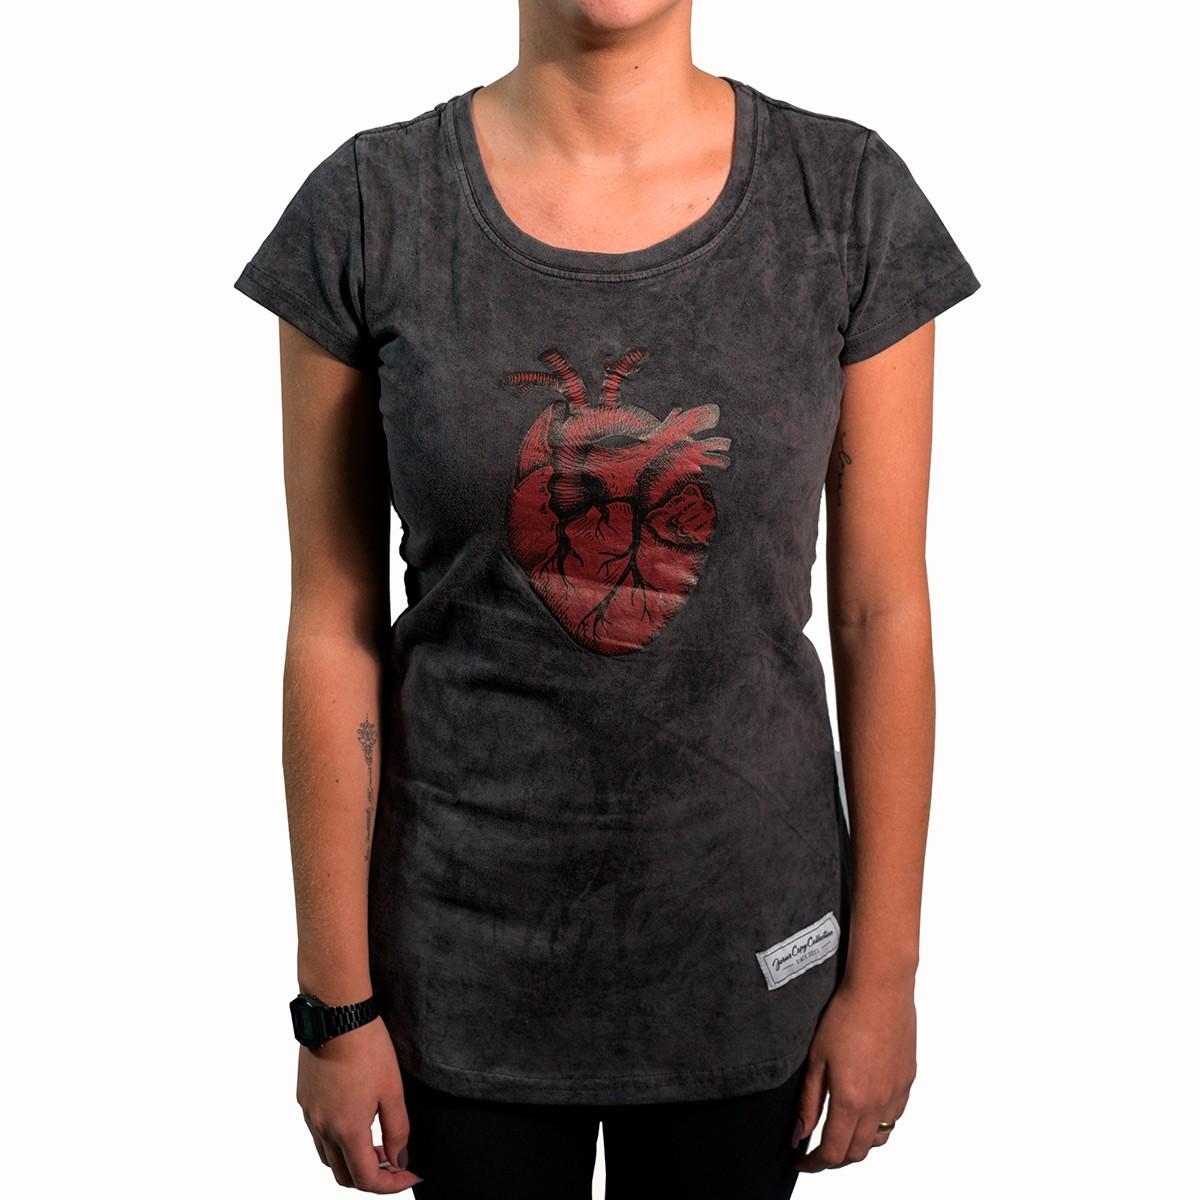 Camiseta Coração Jesuscopy Feminina - #REINODEPONTACABEÇA  - Jesuscopy